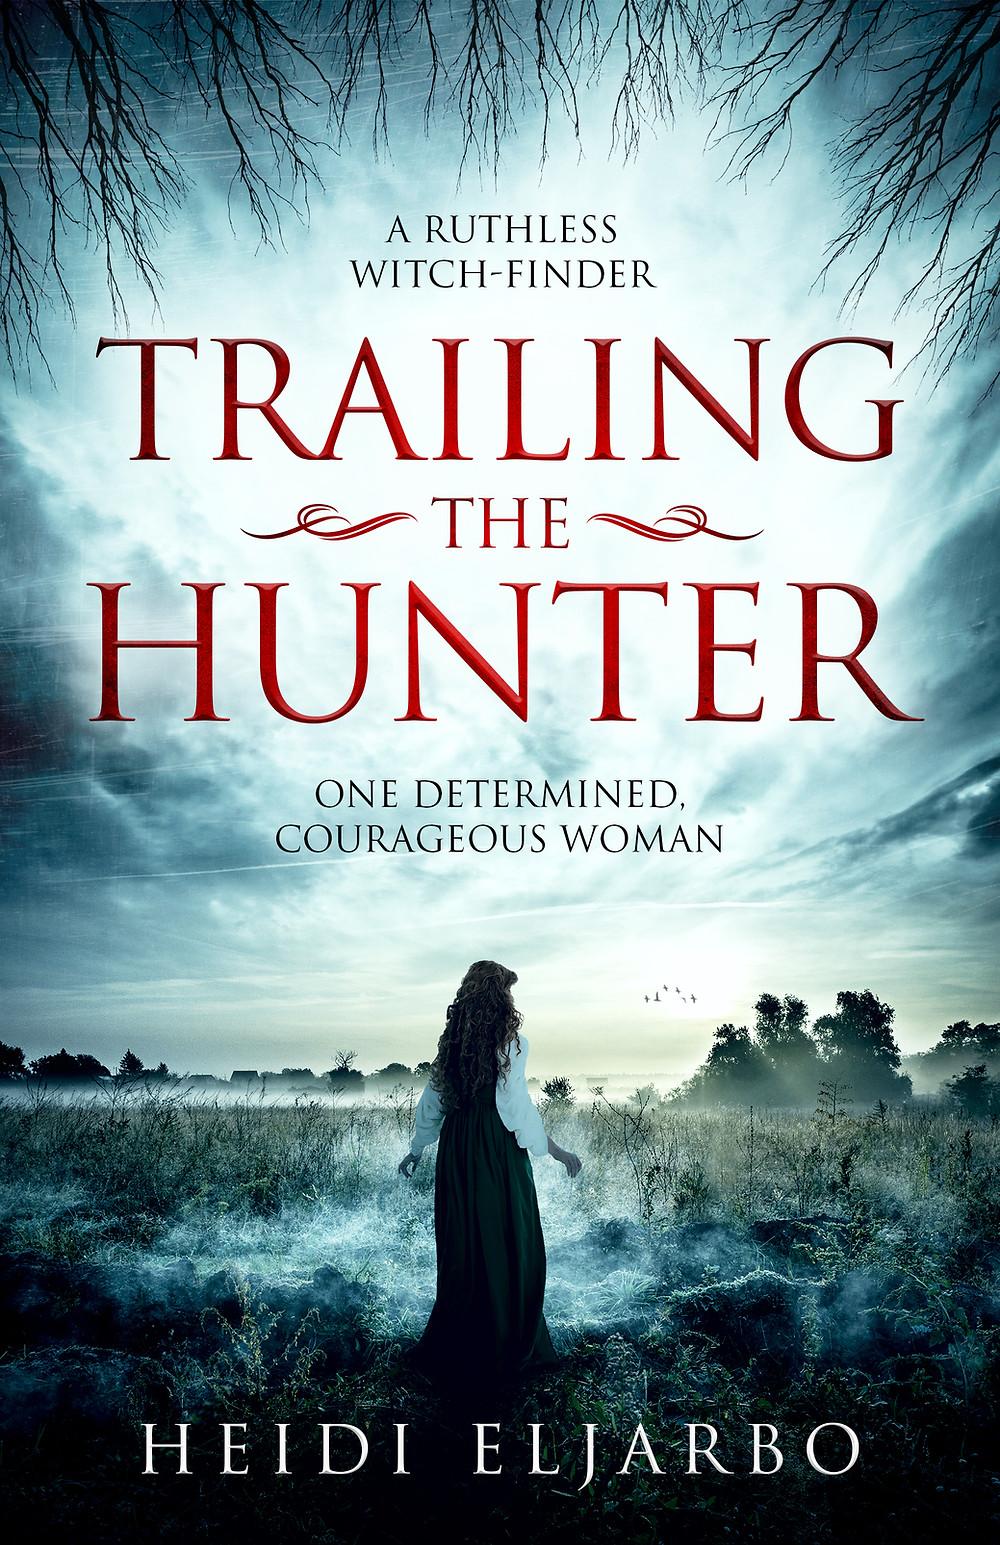 New historical novel by Heidi Eljarbo